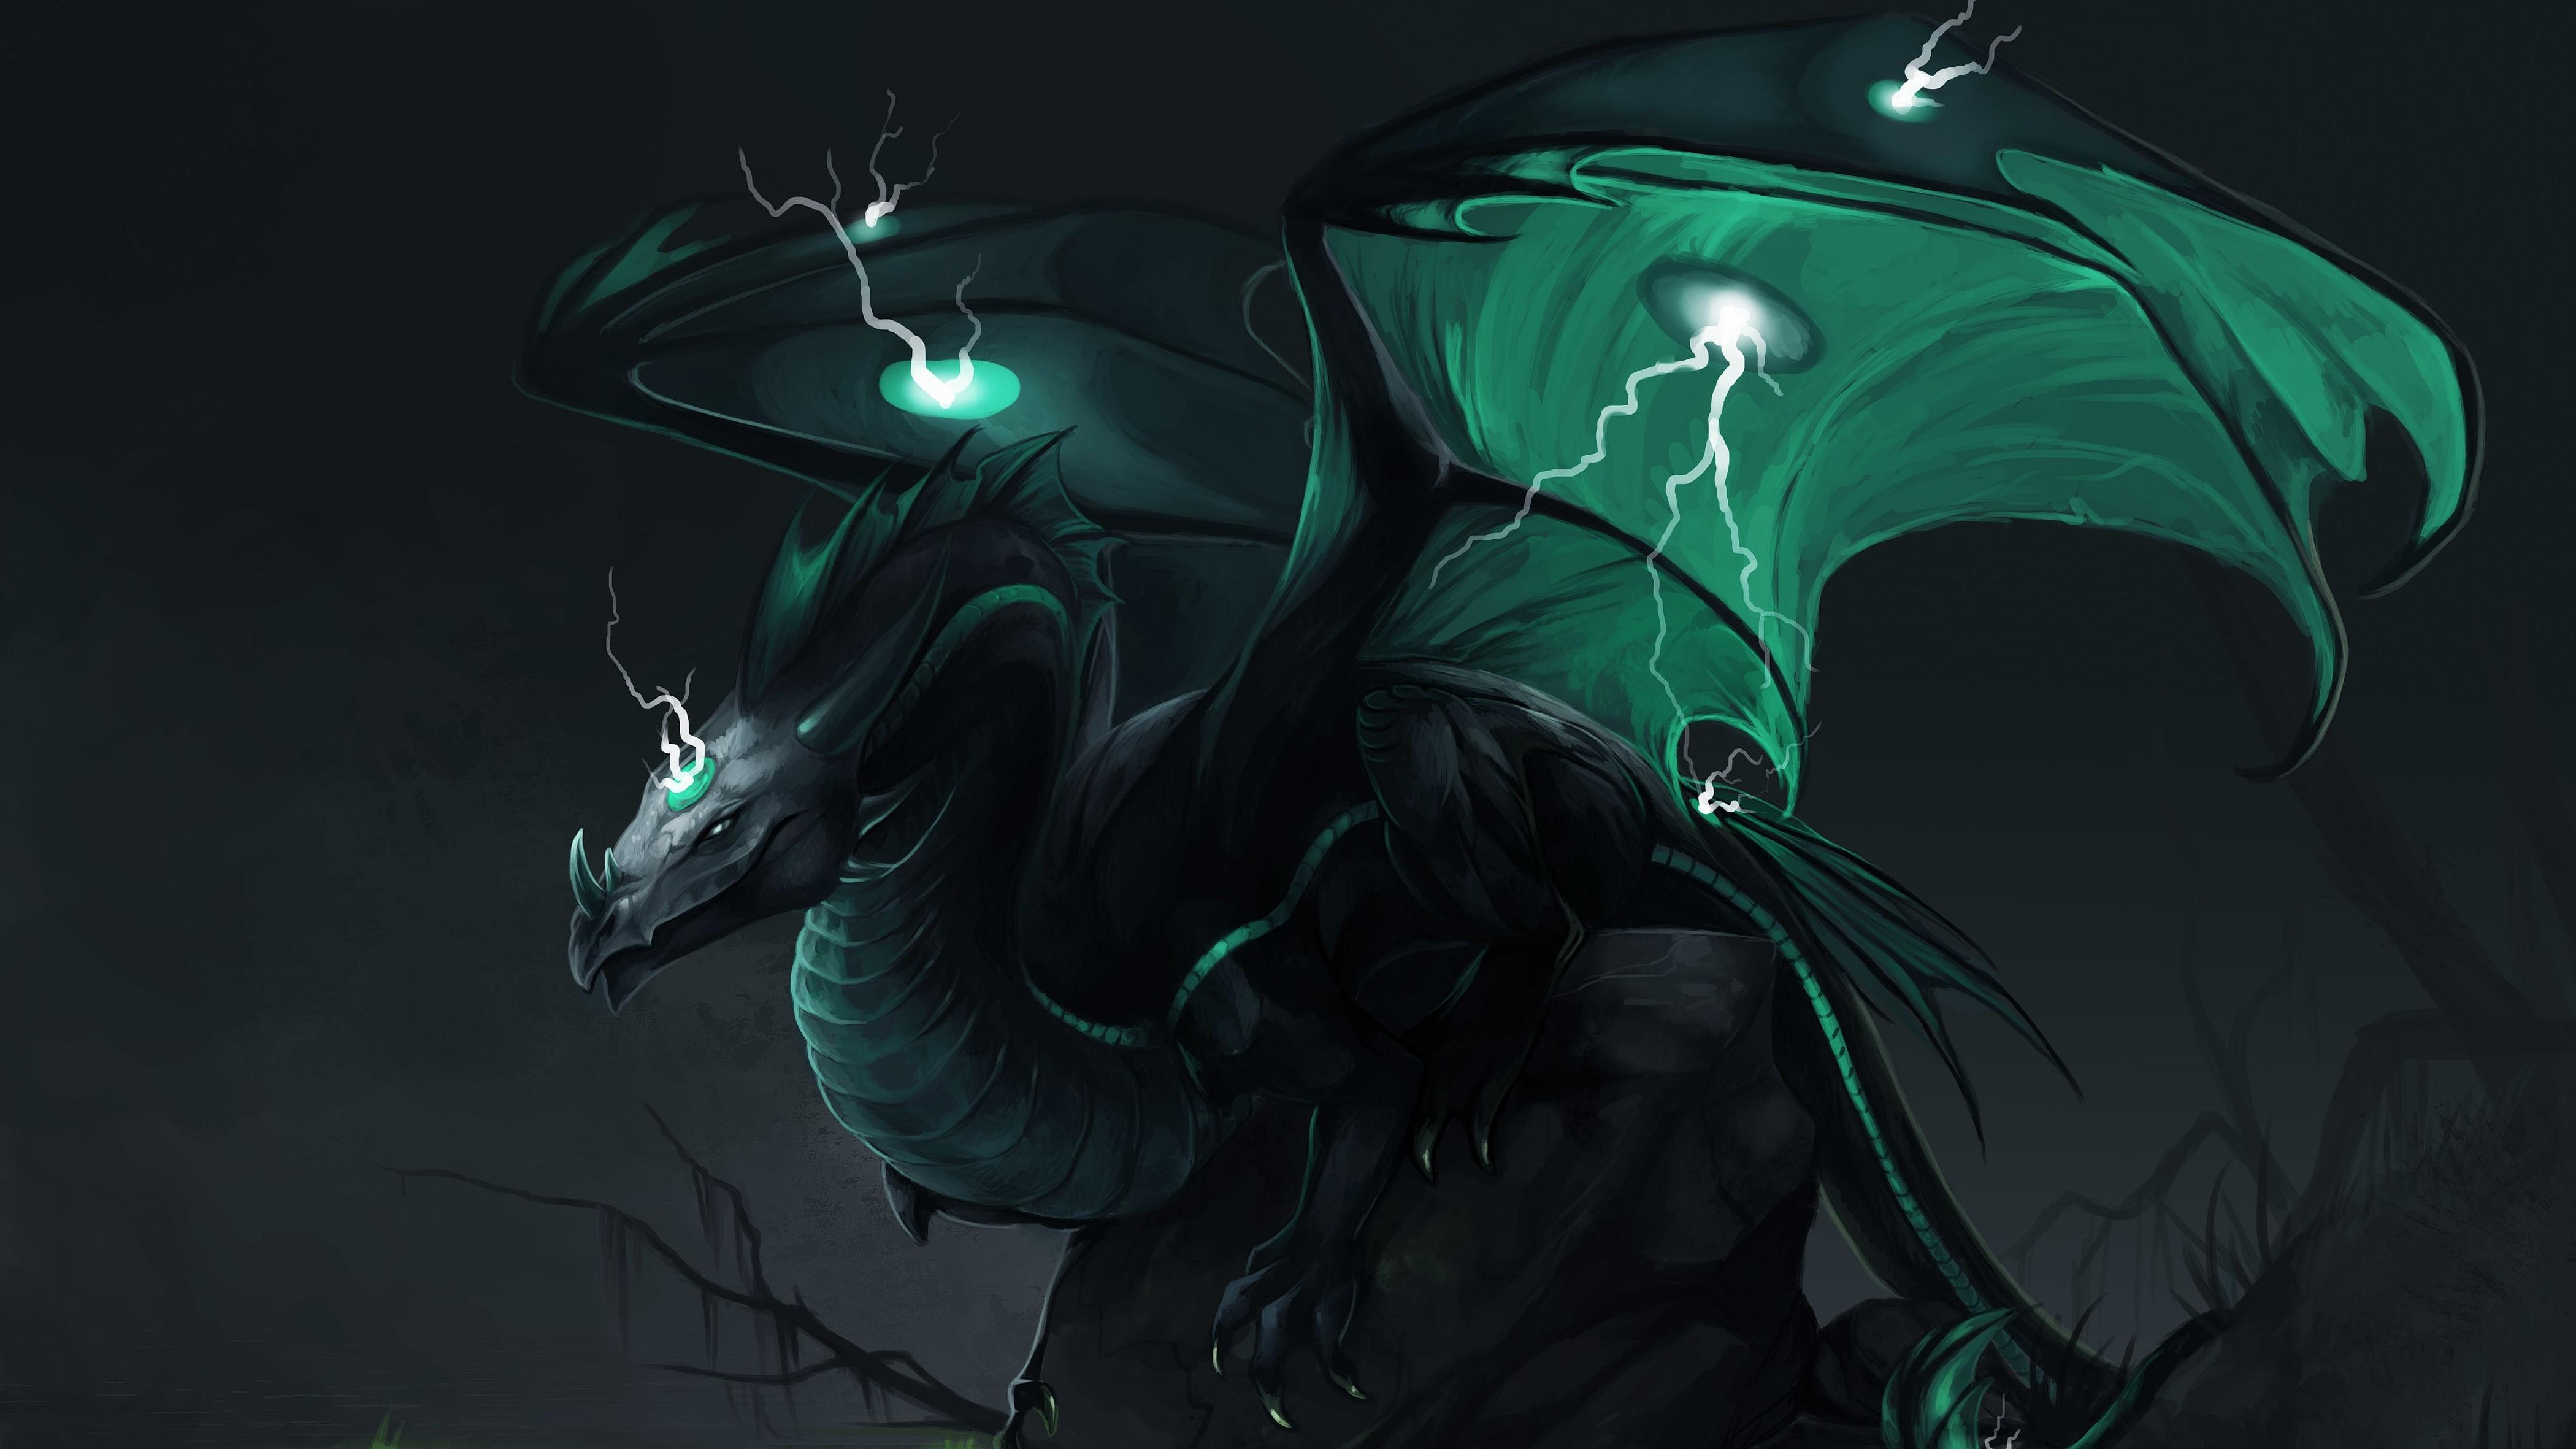 Dragon Fantasy HD Wallpaper Search more high Definition 1080p 720p 4200x2362